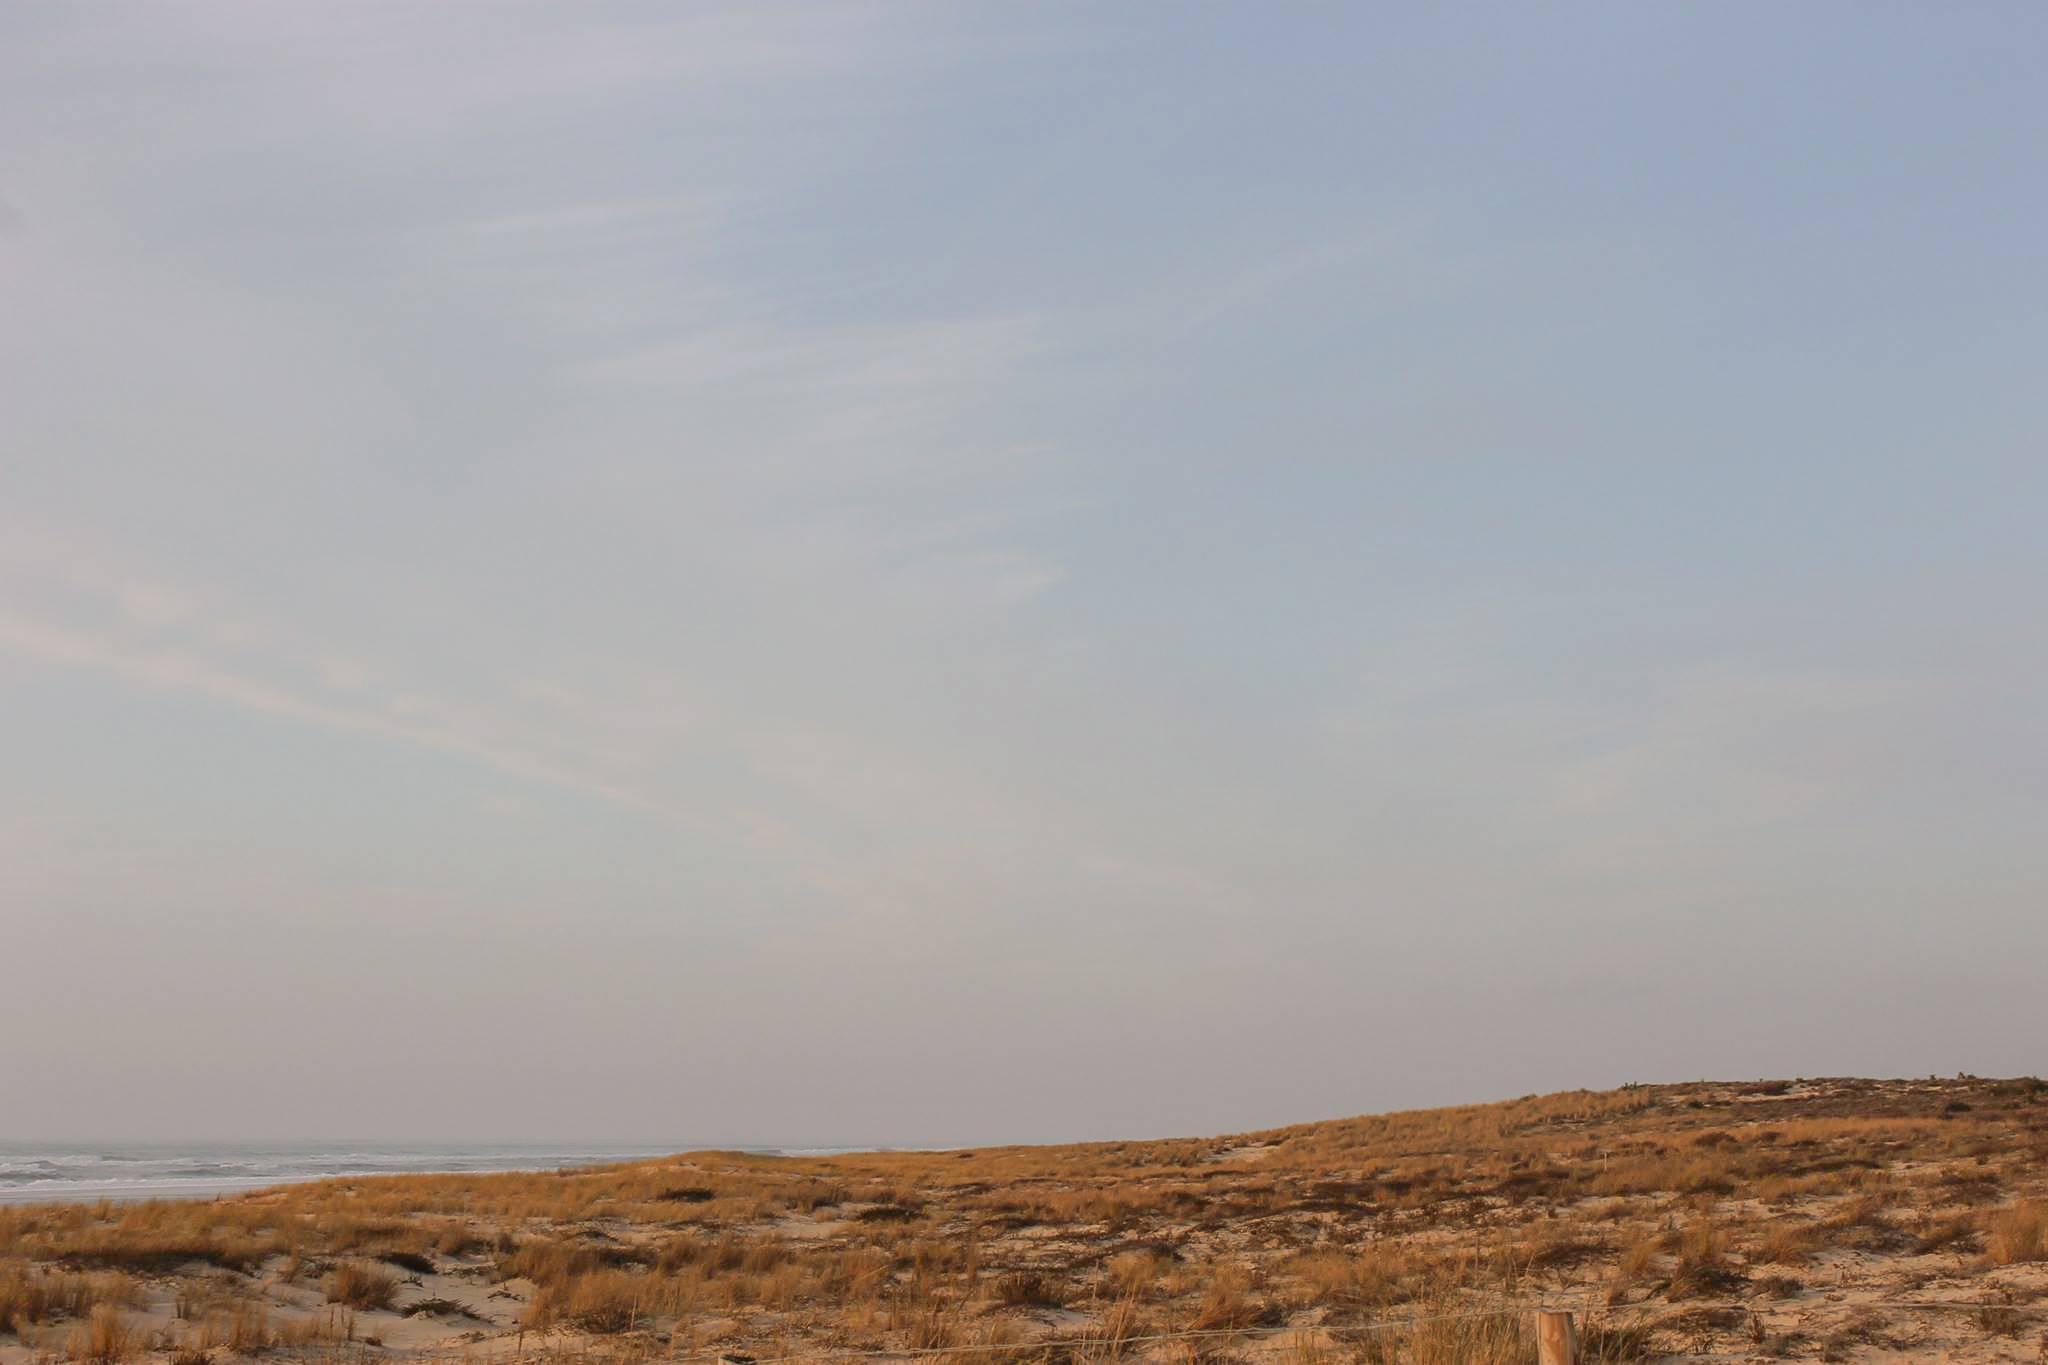 Photo 1: La Pointe - Balade inoubliable